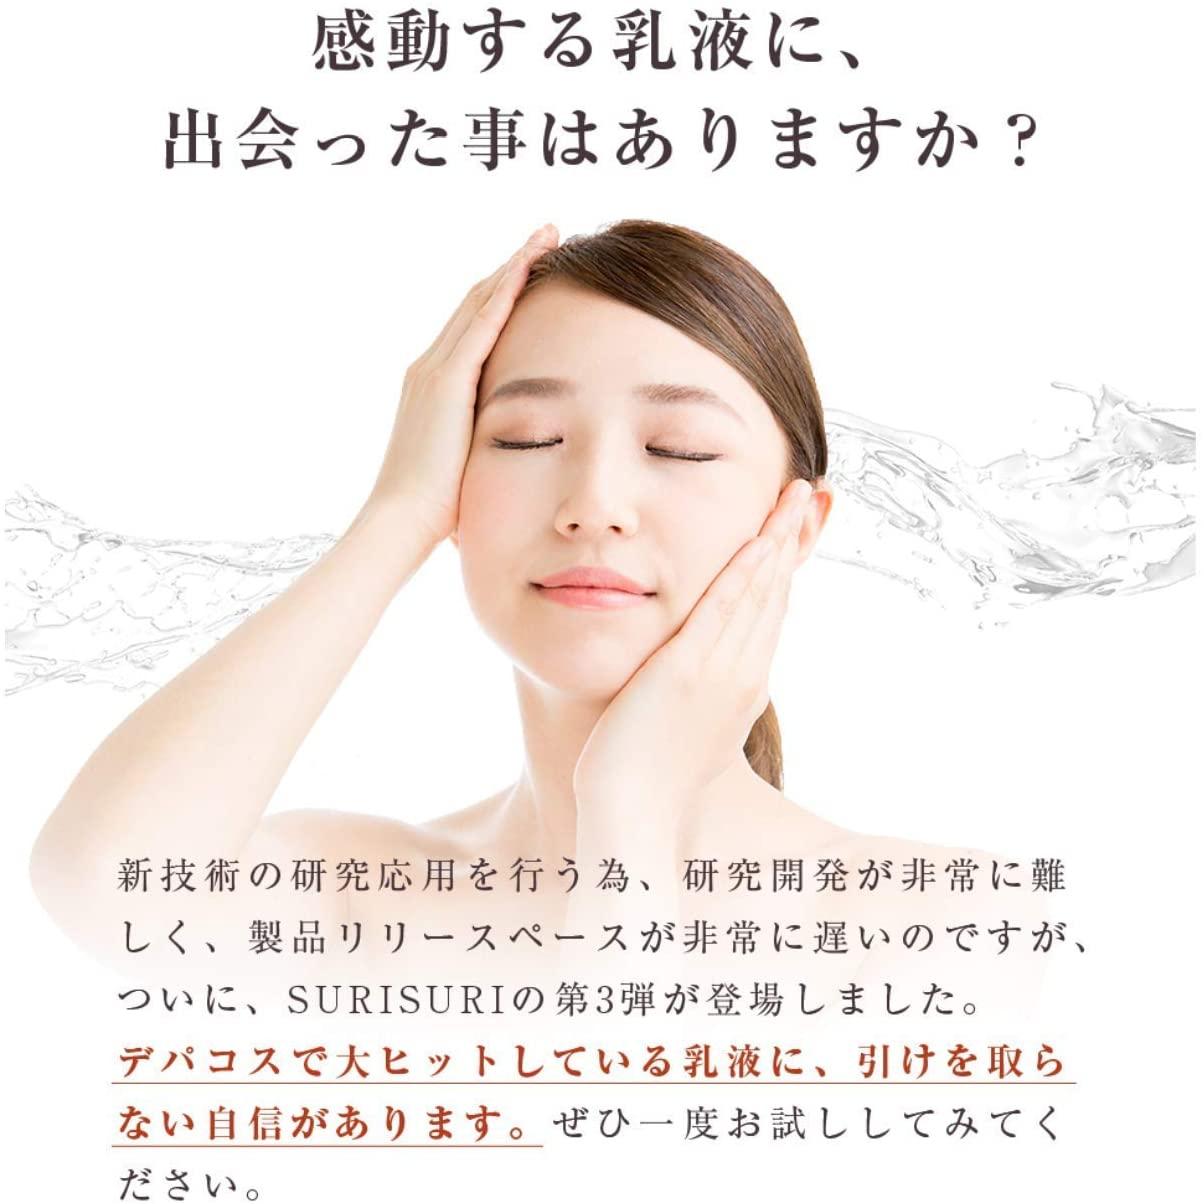 SURISURI(スリスリ) エマルジョン (乳液)の商品画像13